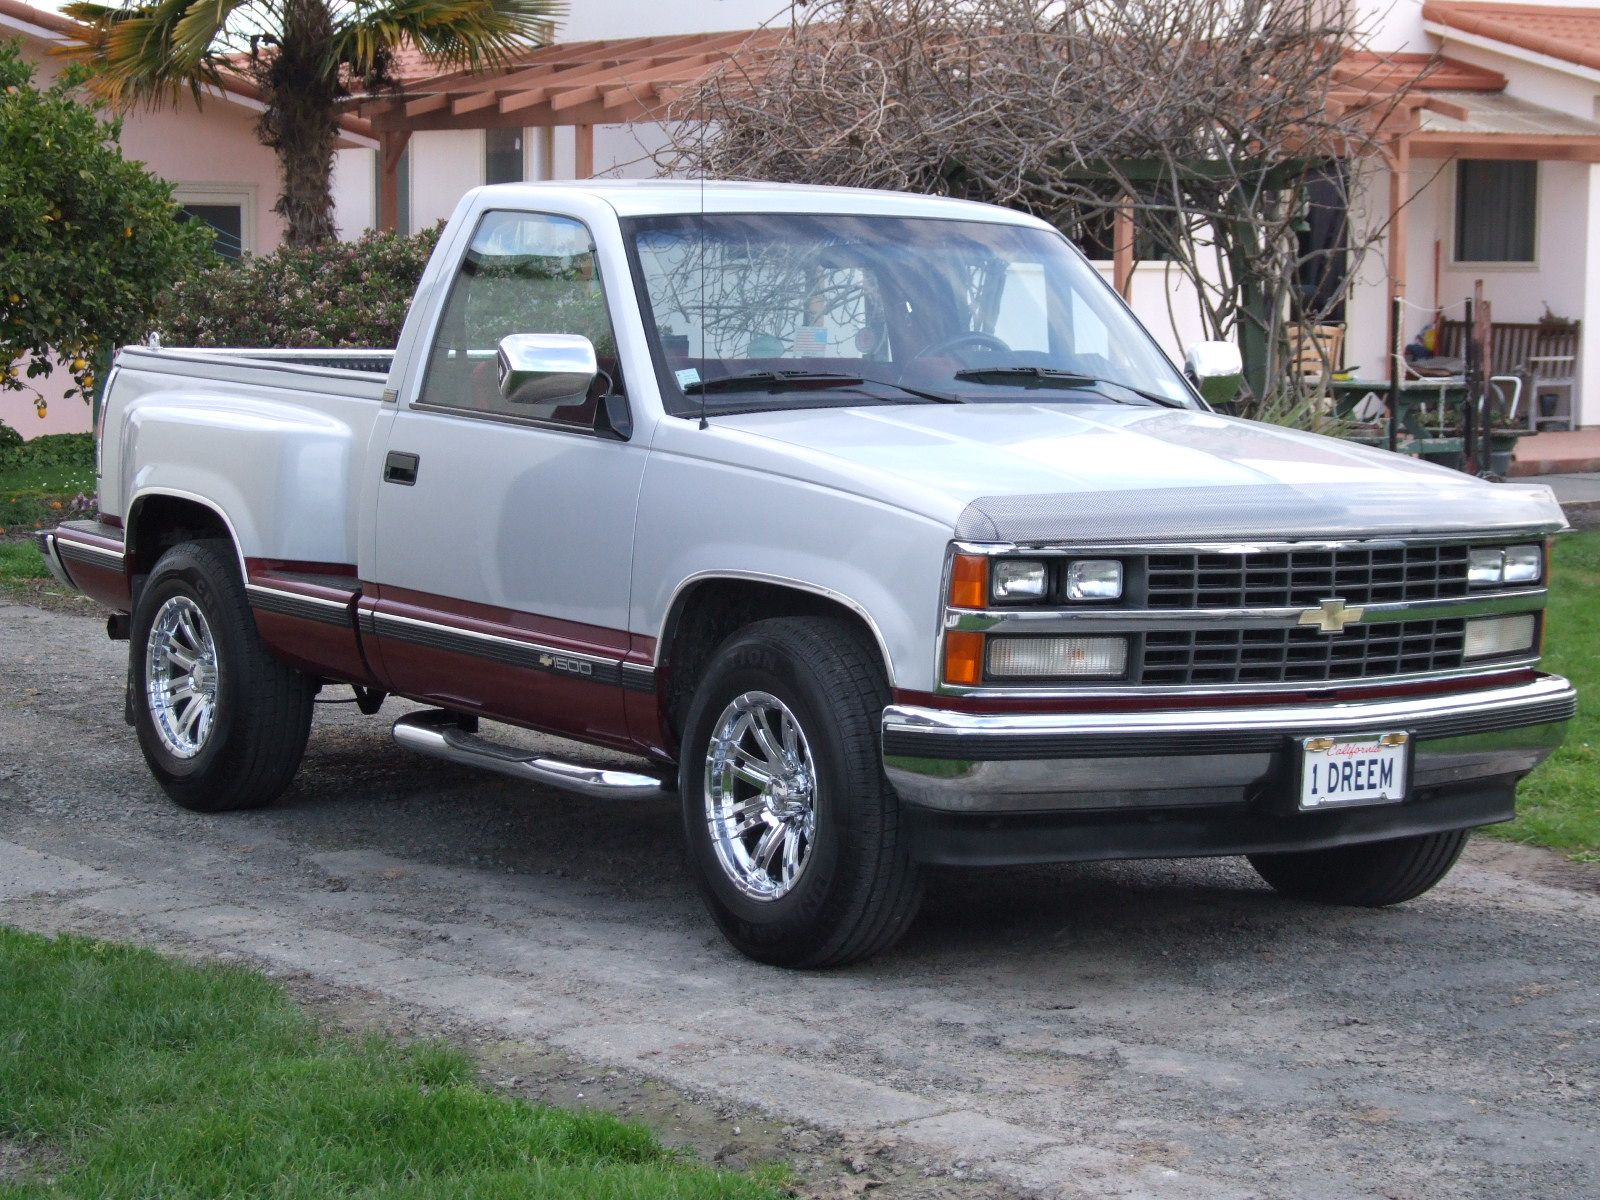 medium resolution of 1 owner 1989 chevy silverado bought in oregon 2012